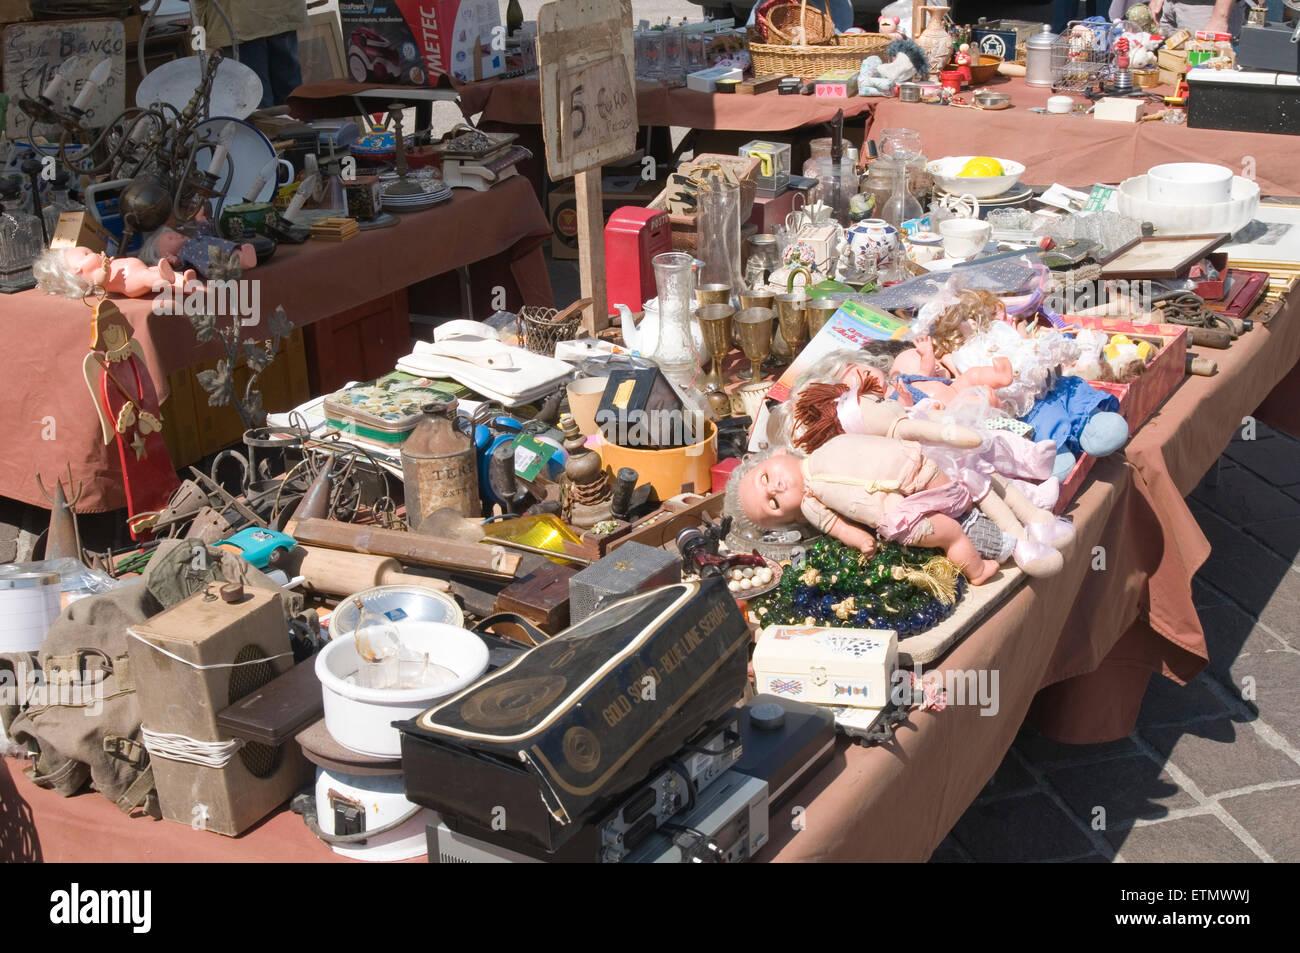 jumblesale sale sales jumble junk table top flee market junk yard ...